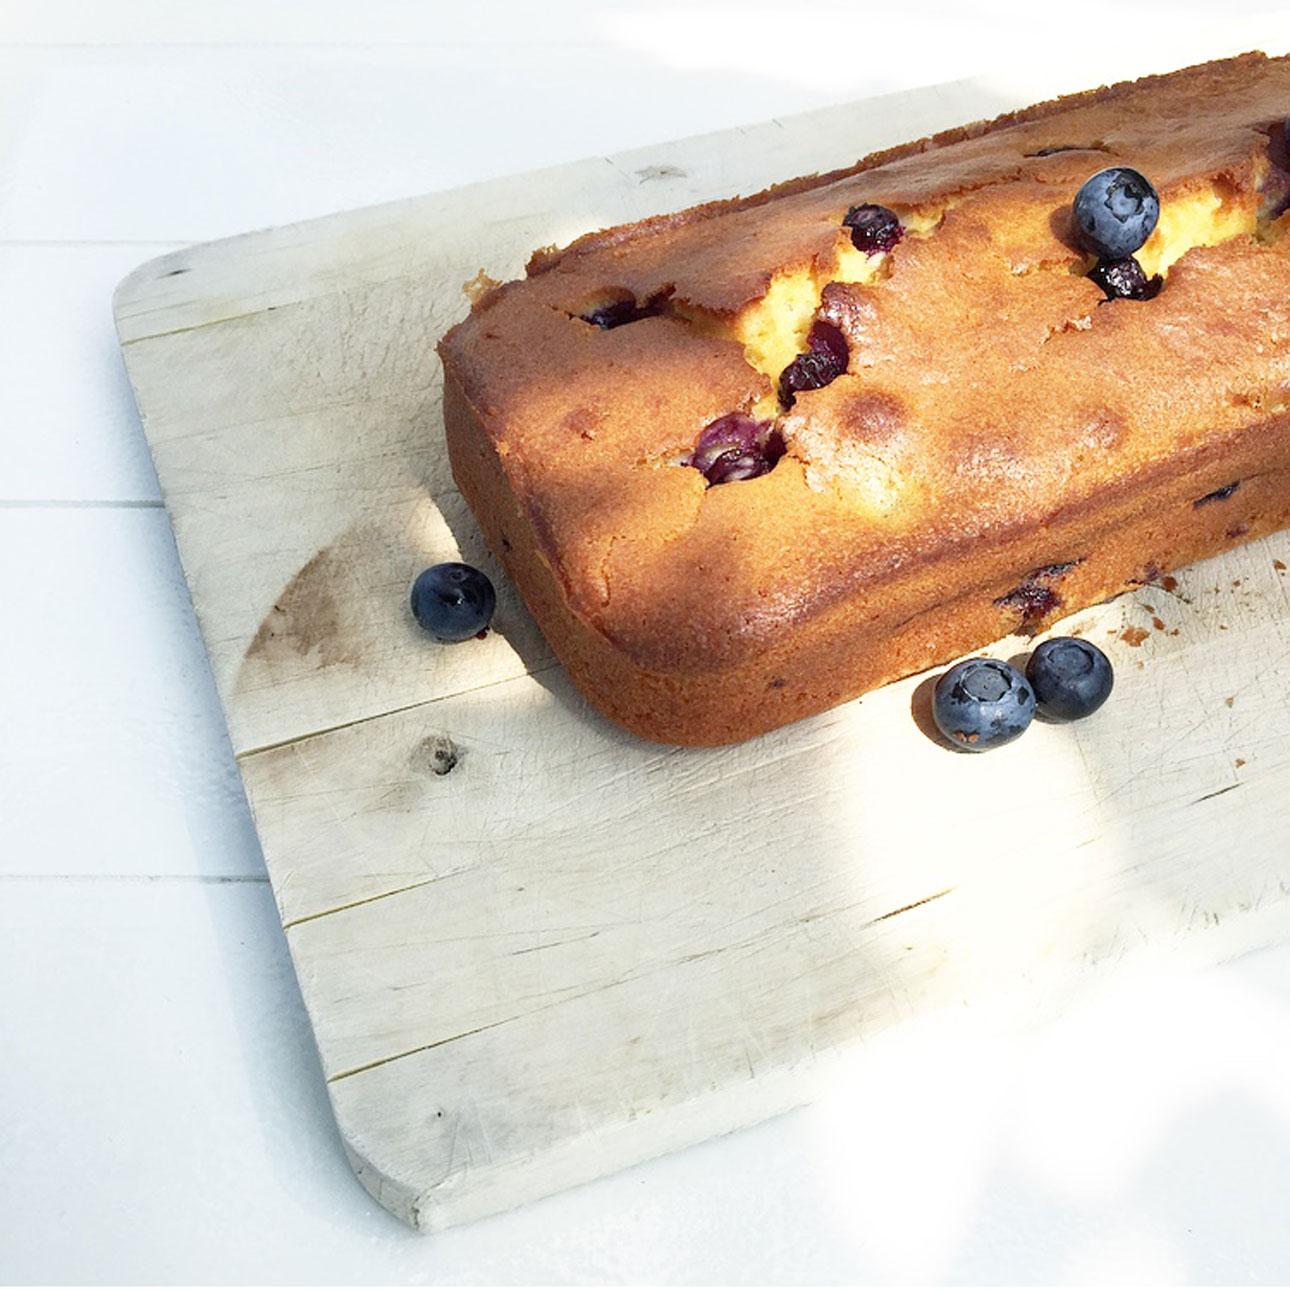 mamalifestyle juli 2015 14 cake bakken